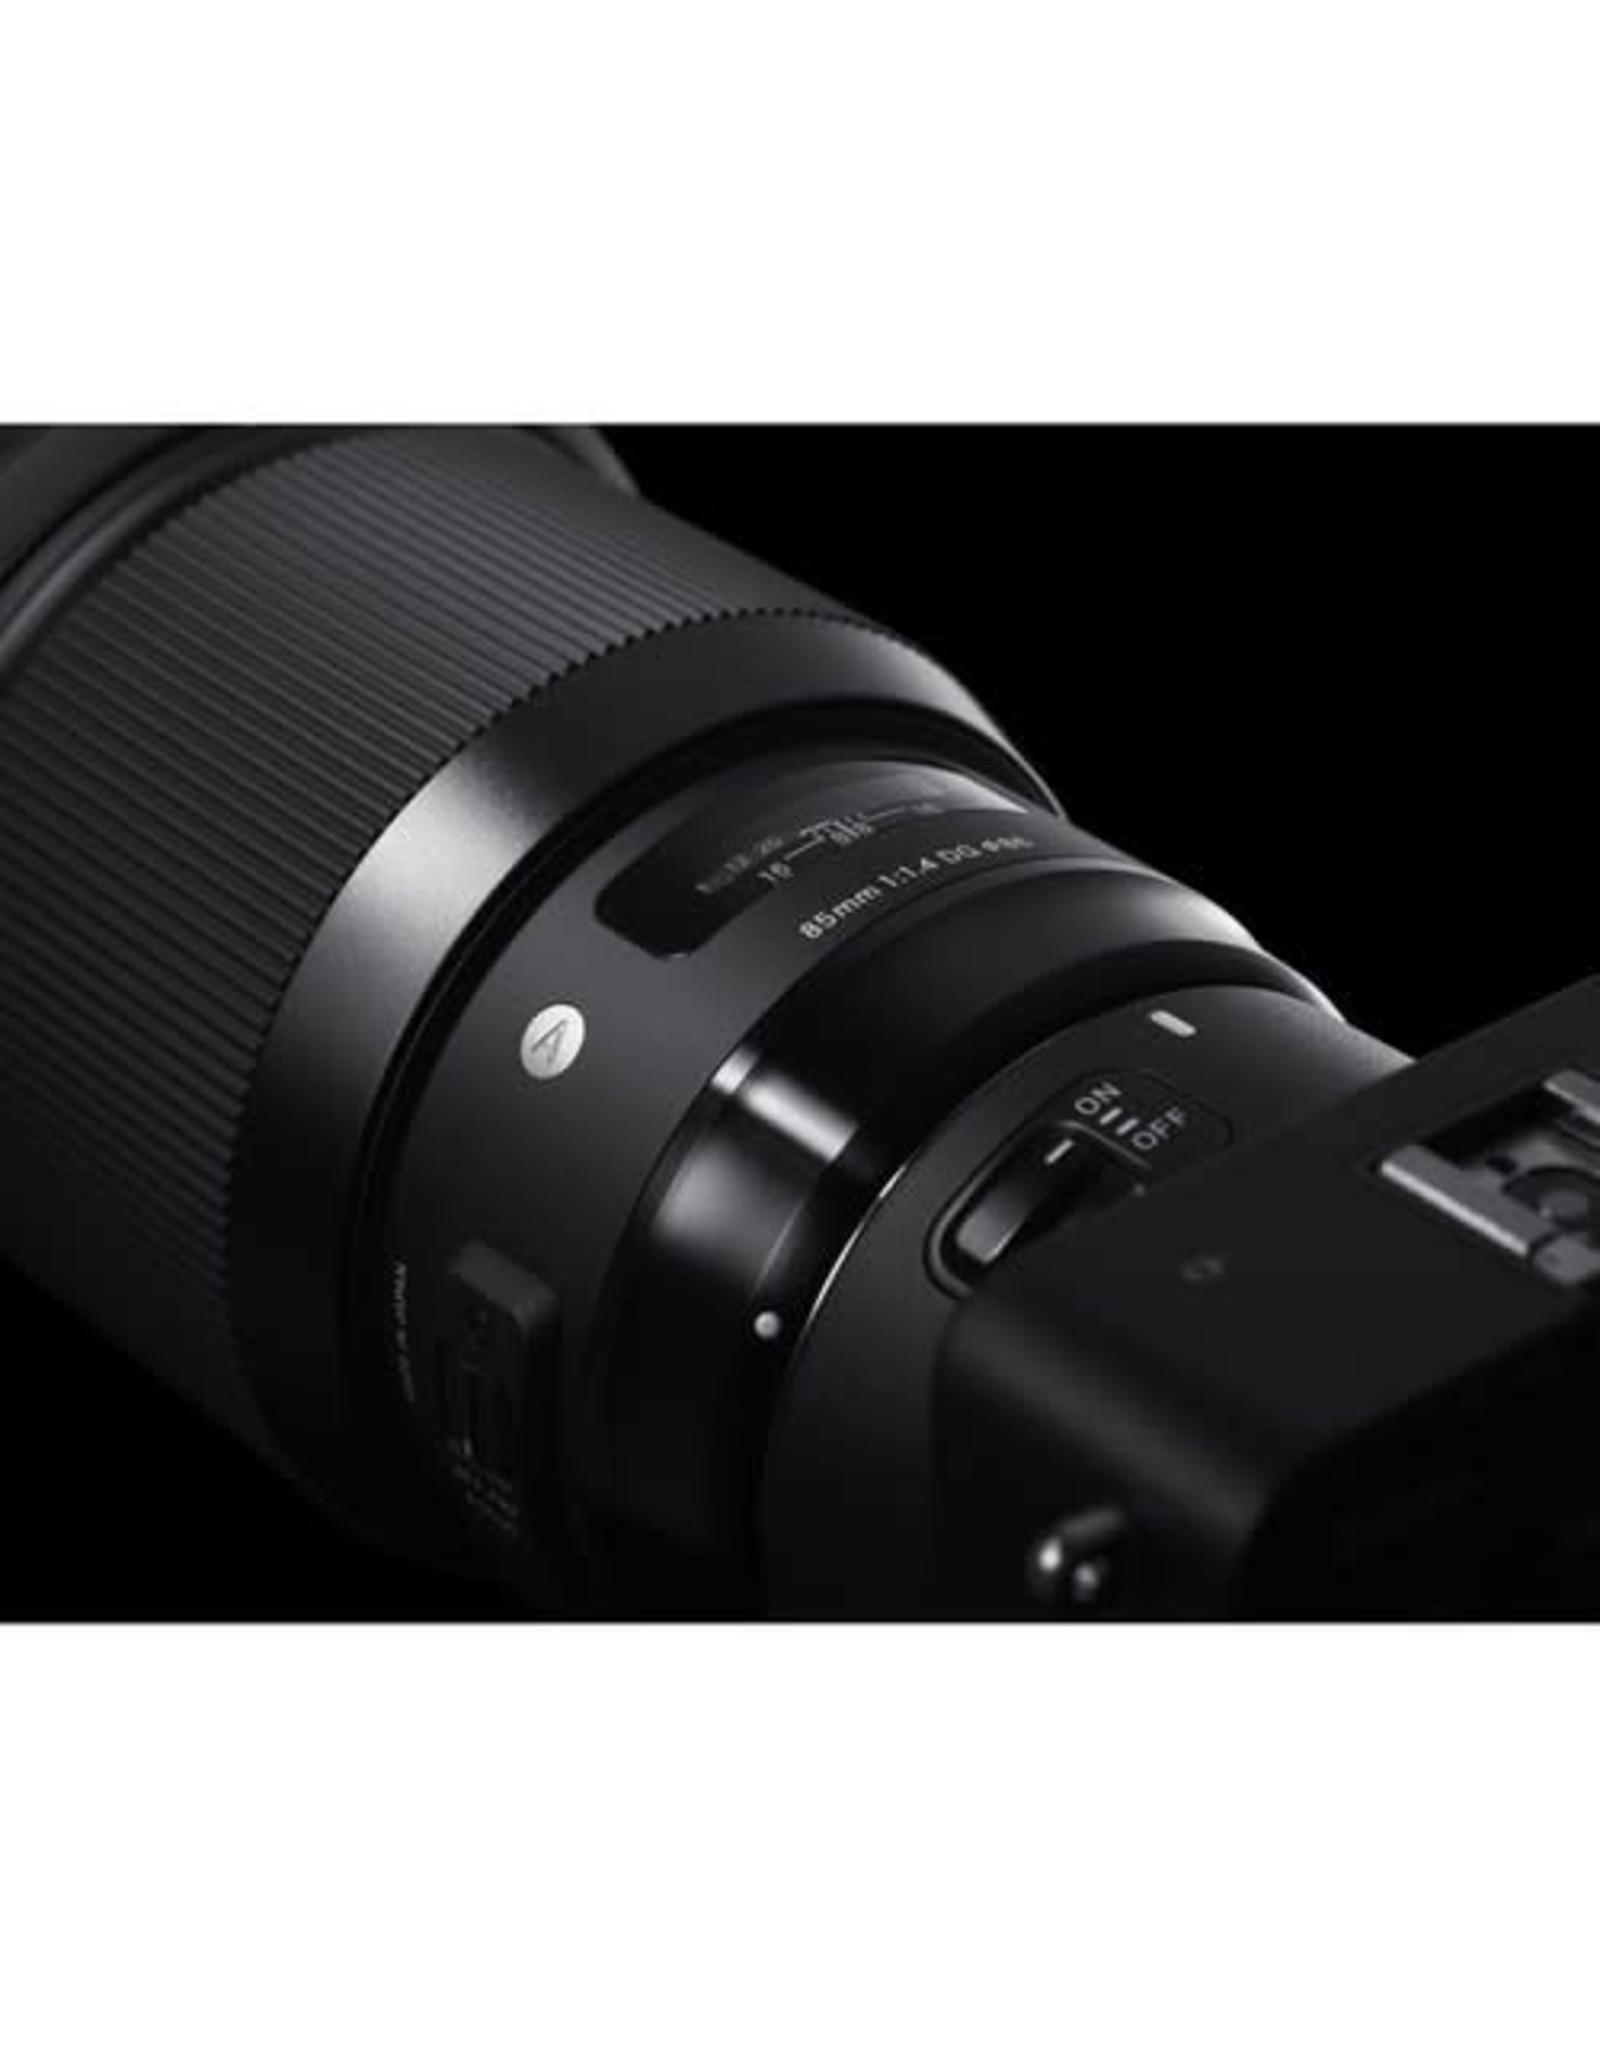 Sigma Sigma 85mm f1.4 Art DG HSM